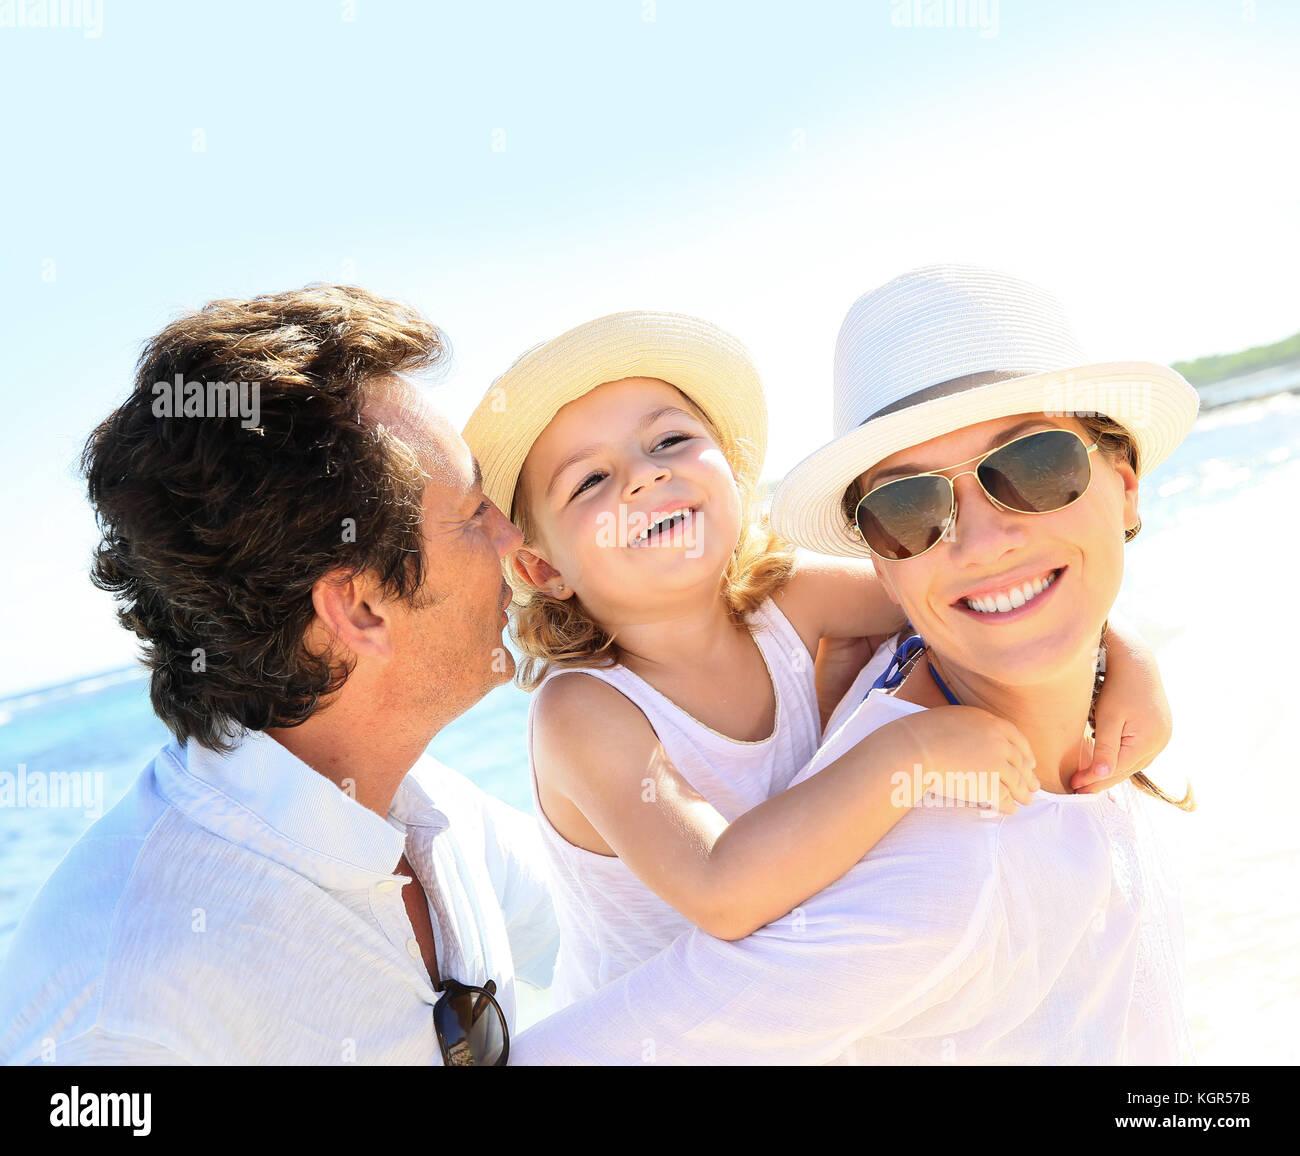 Retrato de familia feliz en la playa. Imagen De Stock